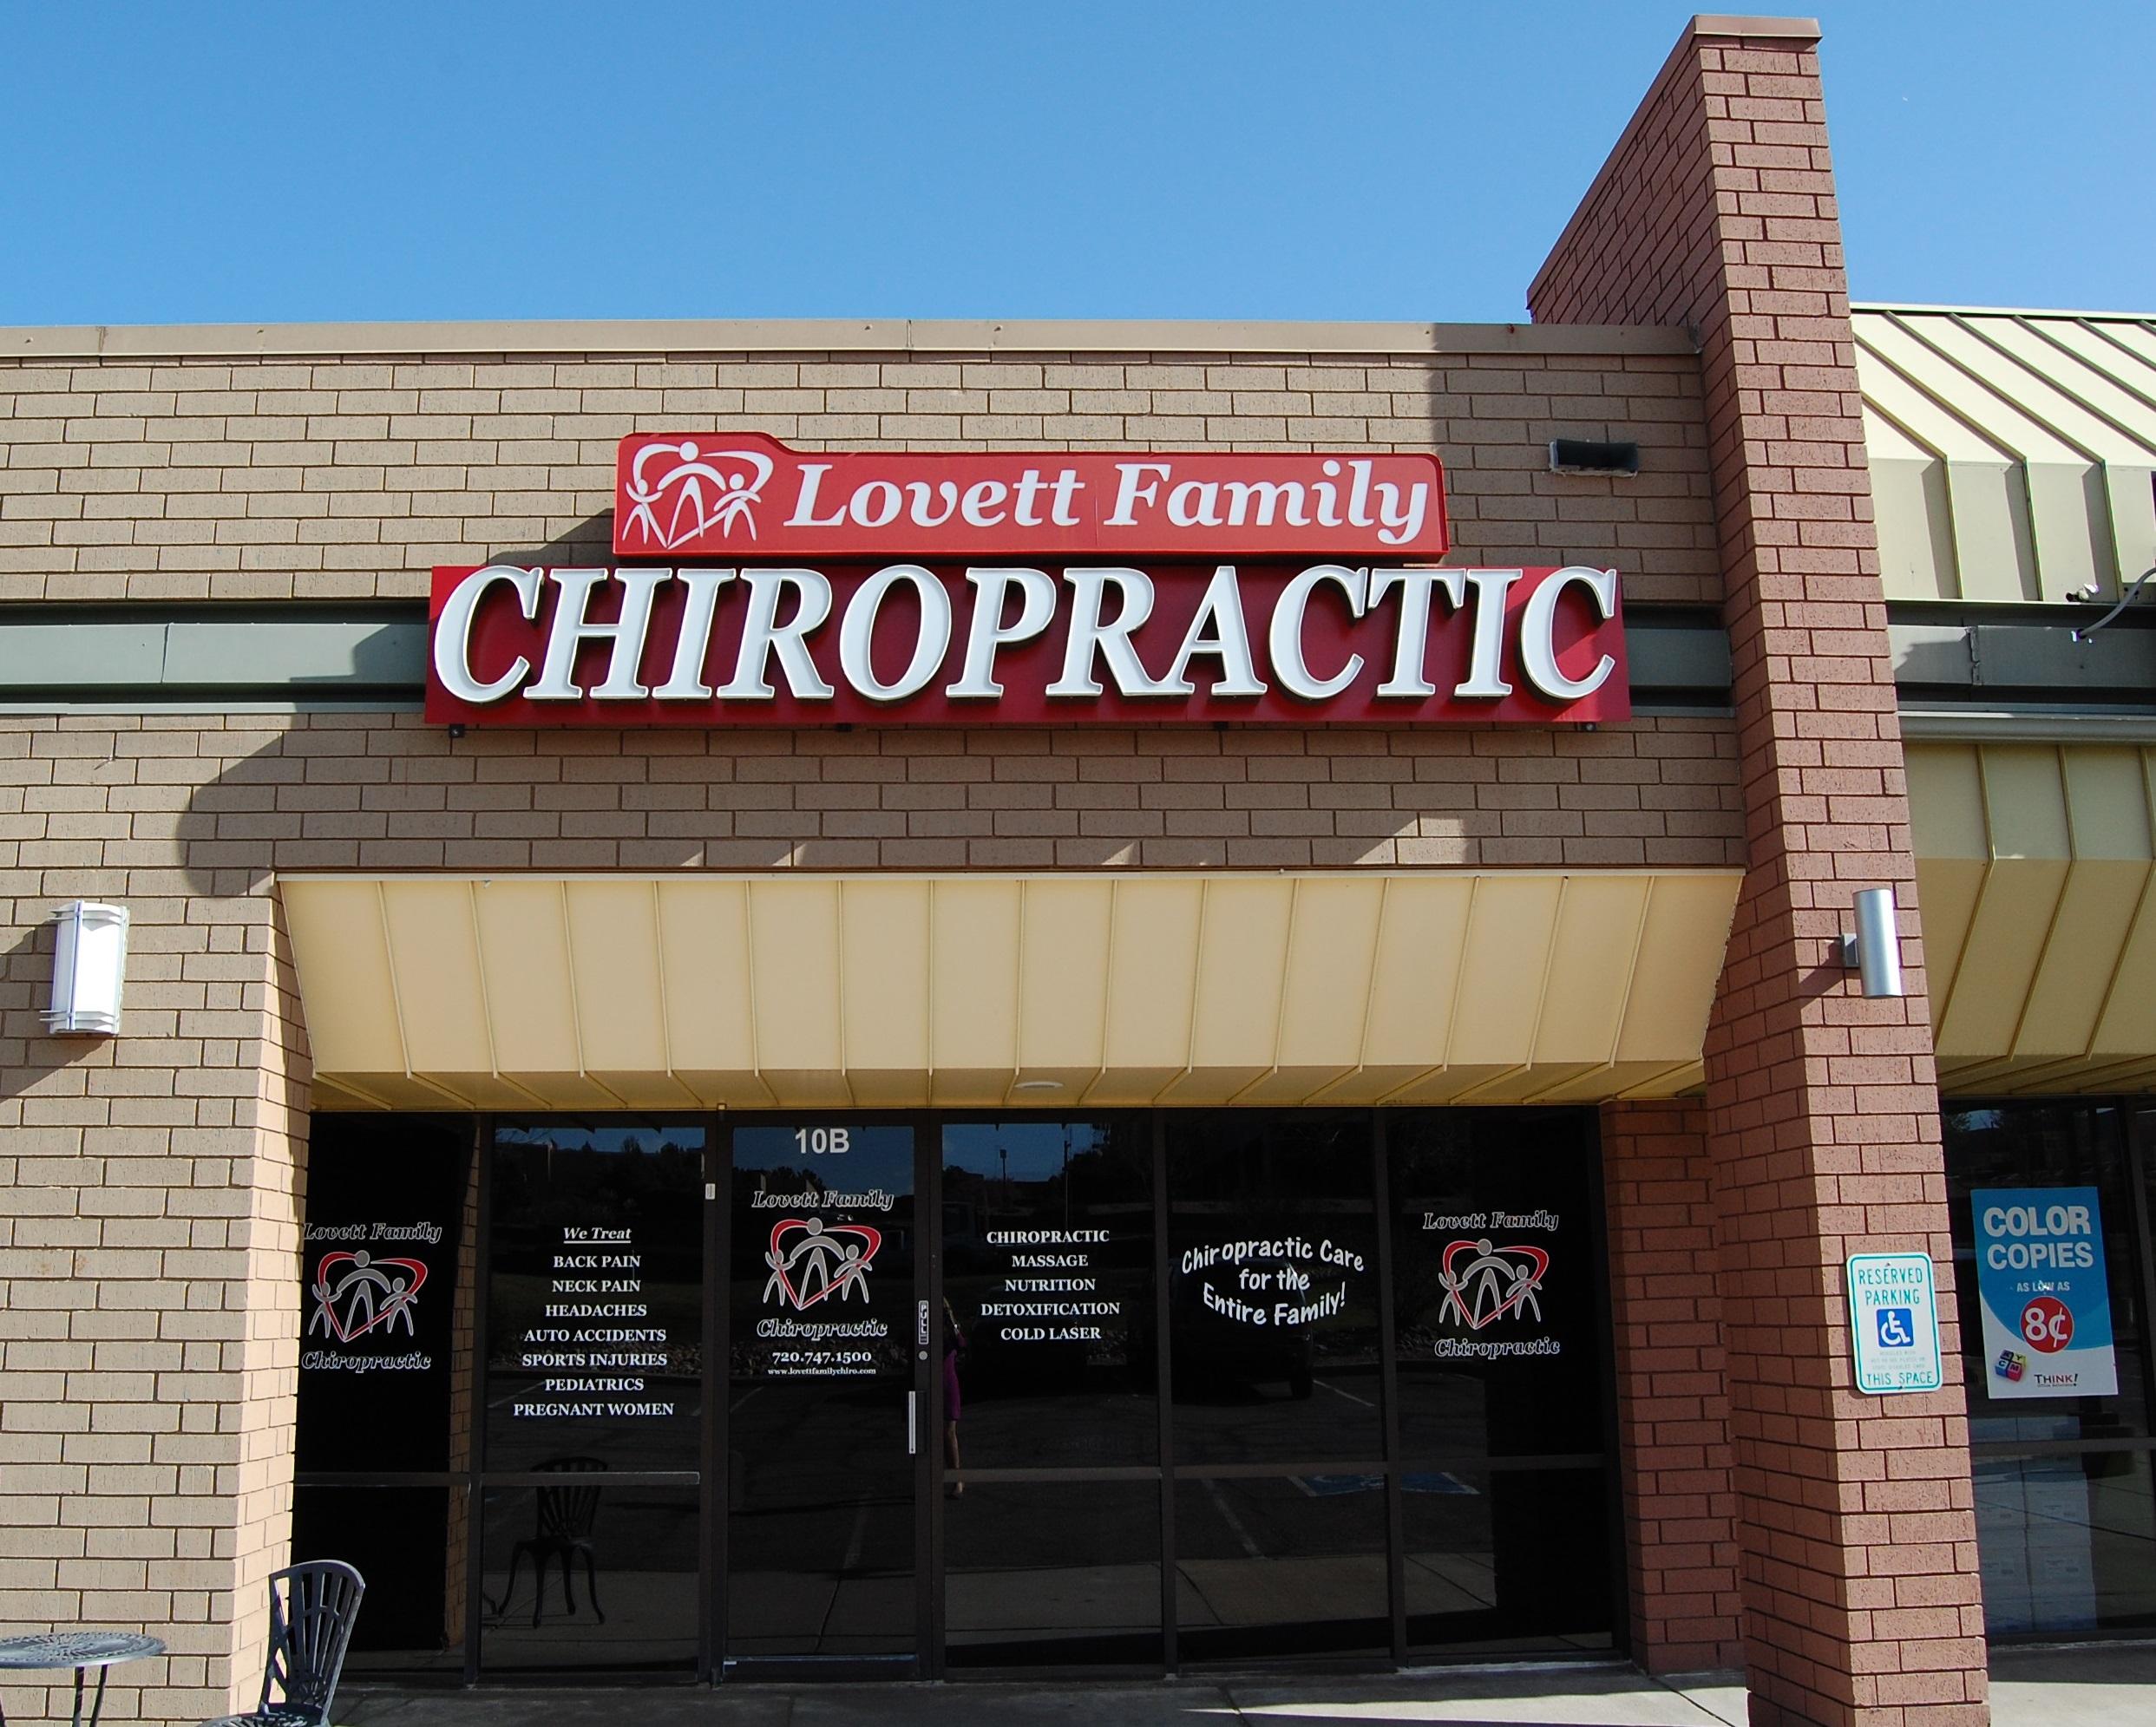 Lovett Family Chiropractic and Wellness Center image 0